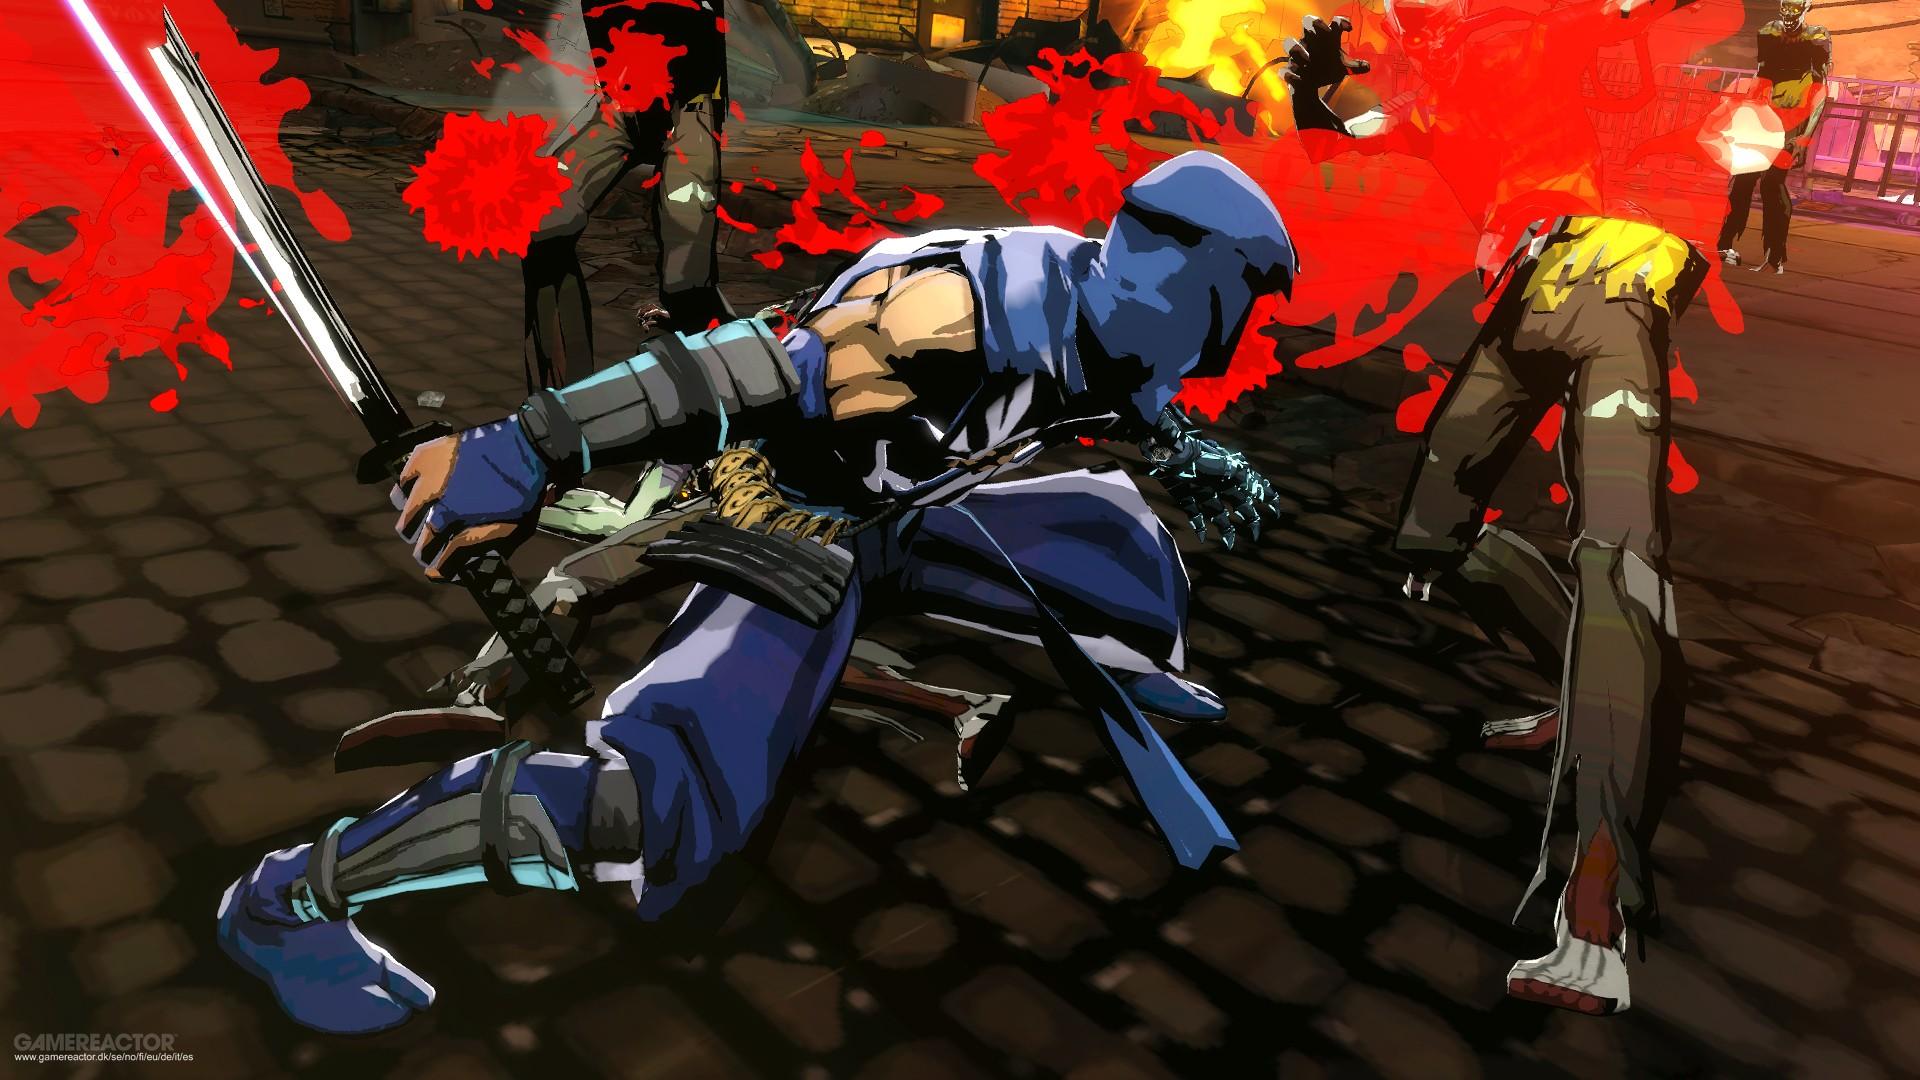 Pictures Of New Screens For Yaiba Ninja Gaiden Z 2 24